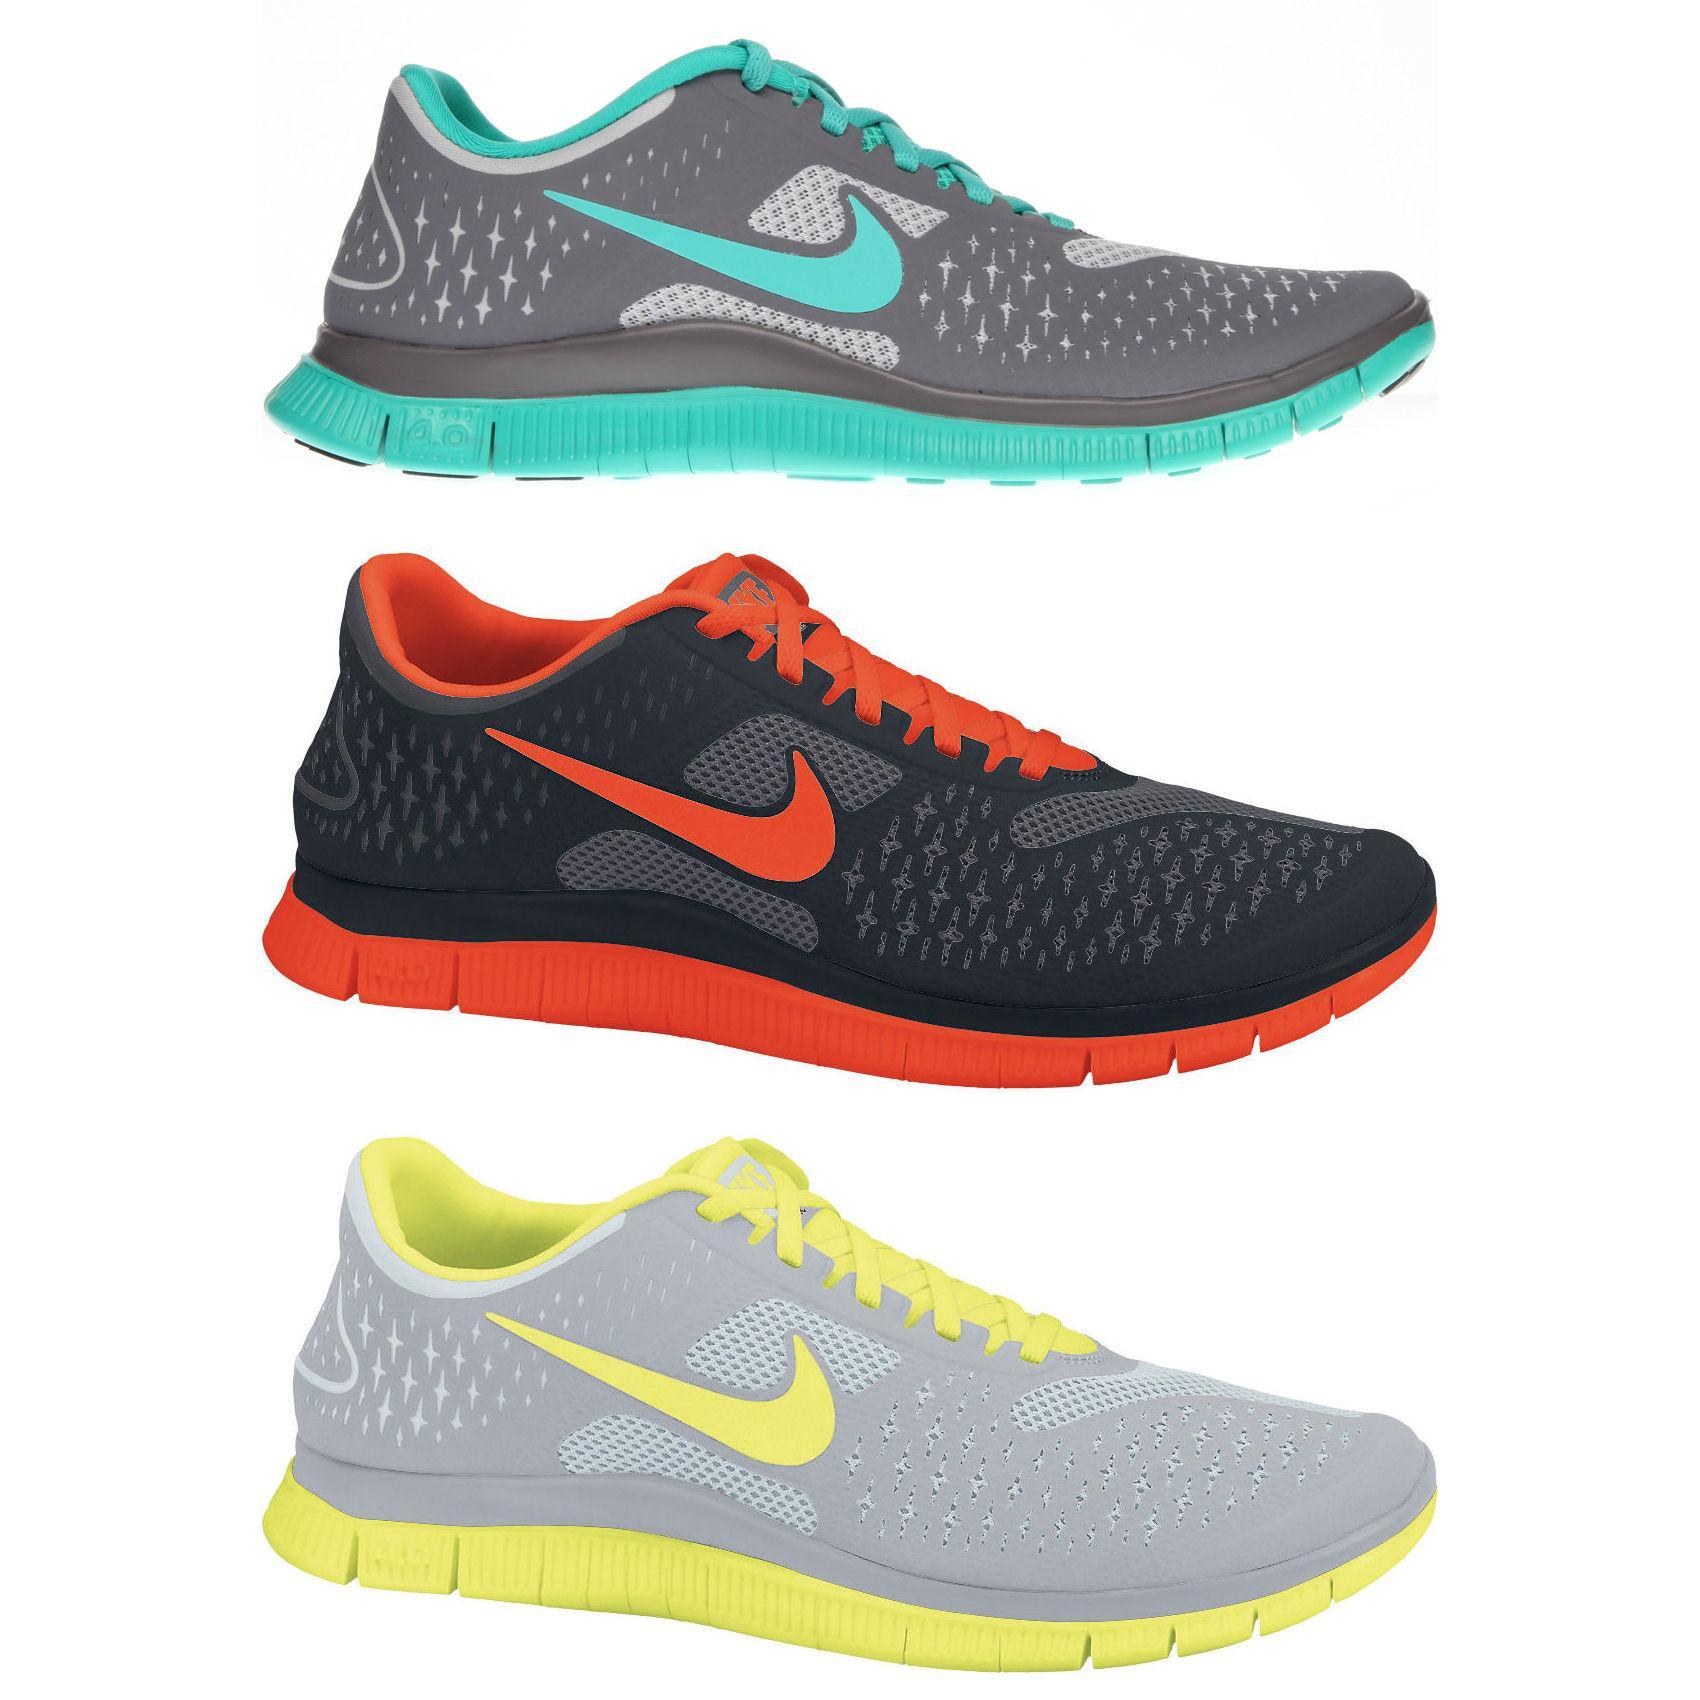 nike 4.0 shoes